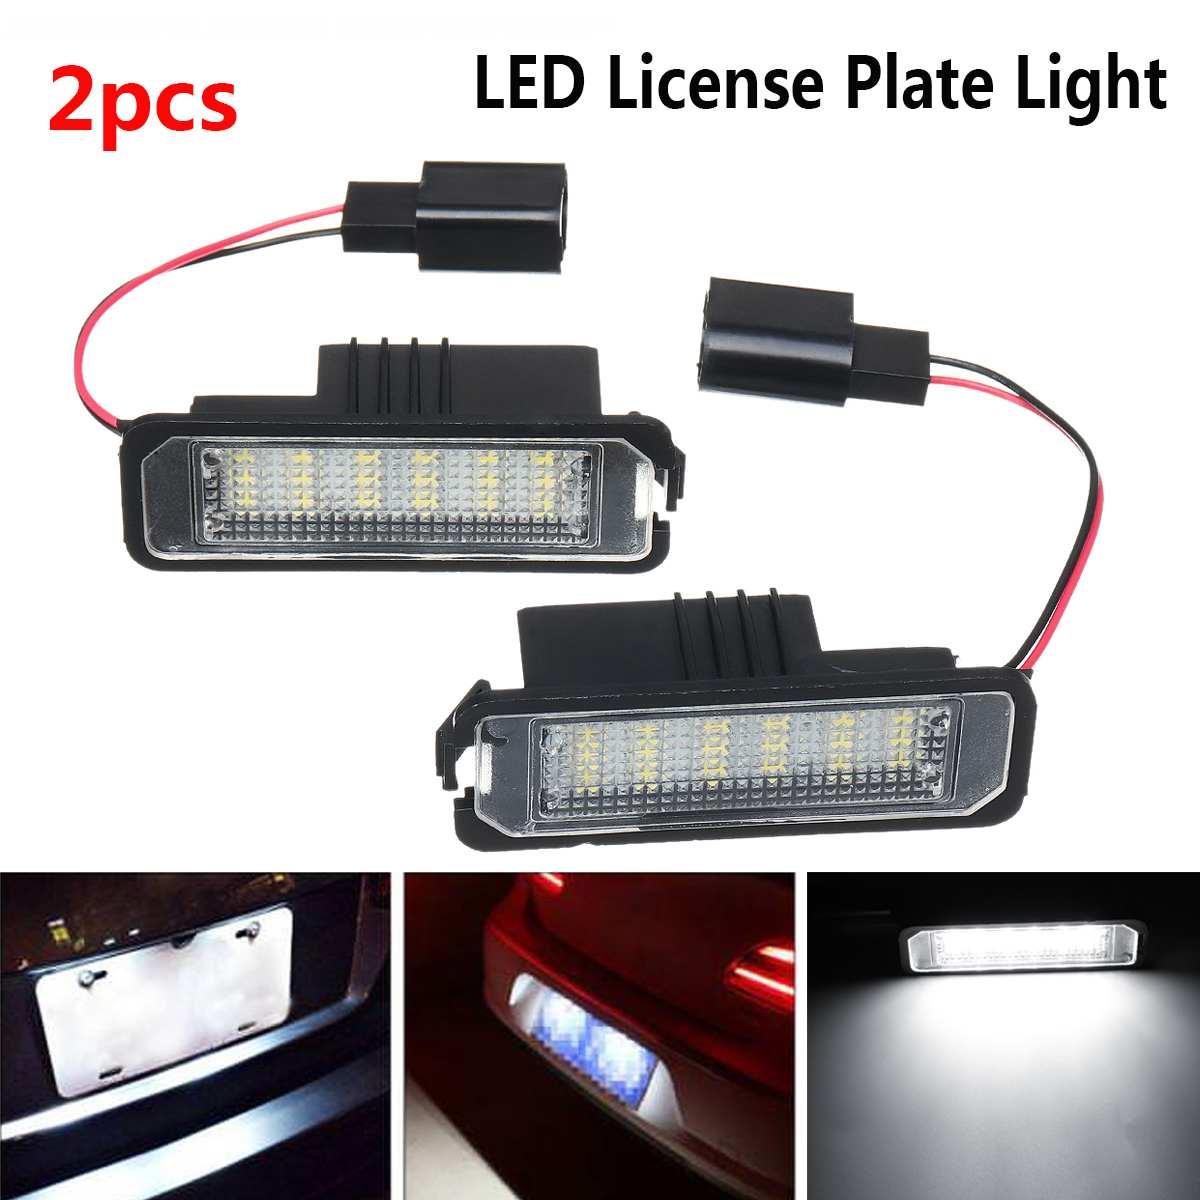 2Pcs 12V 5W LEDจำนวนใบอนุญาตLight PlateสำหรับVW GOLF 4 6 Polo 9Nสำหรับpassatไฟป้ายทะเบียนรถยนต์ภายนอกเข้าถึง